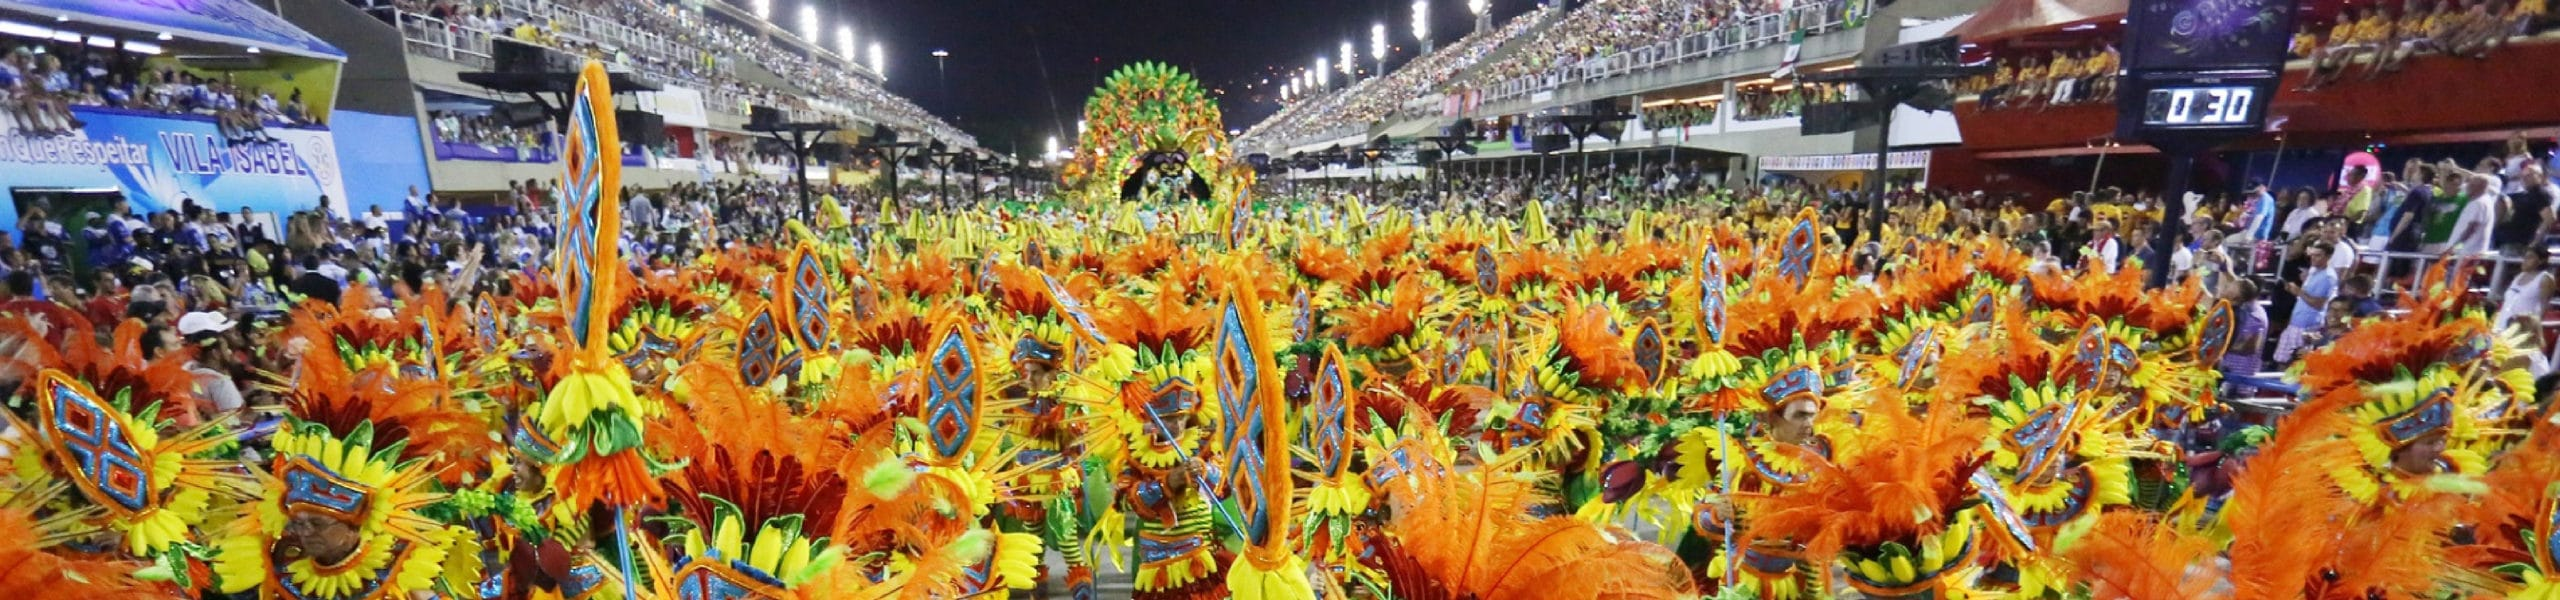 Carnival in Brazil. Rio de Janeiro. RipioTurismo DMC for South America